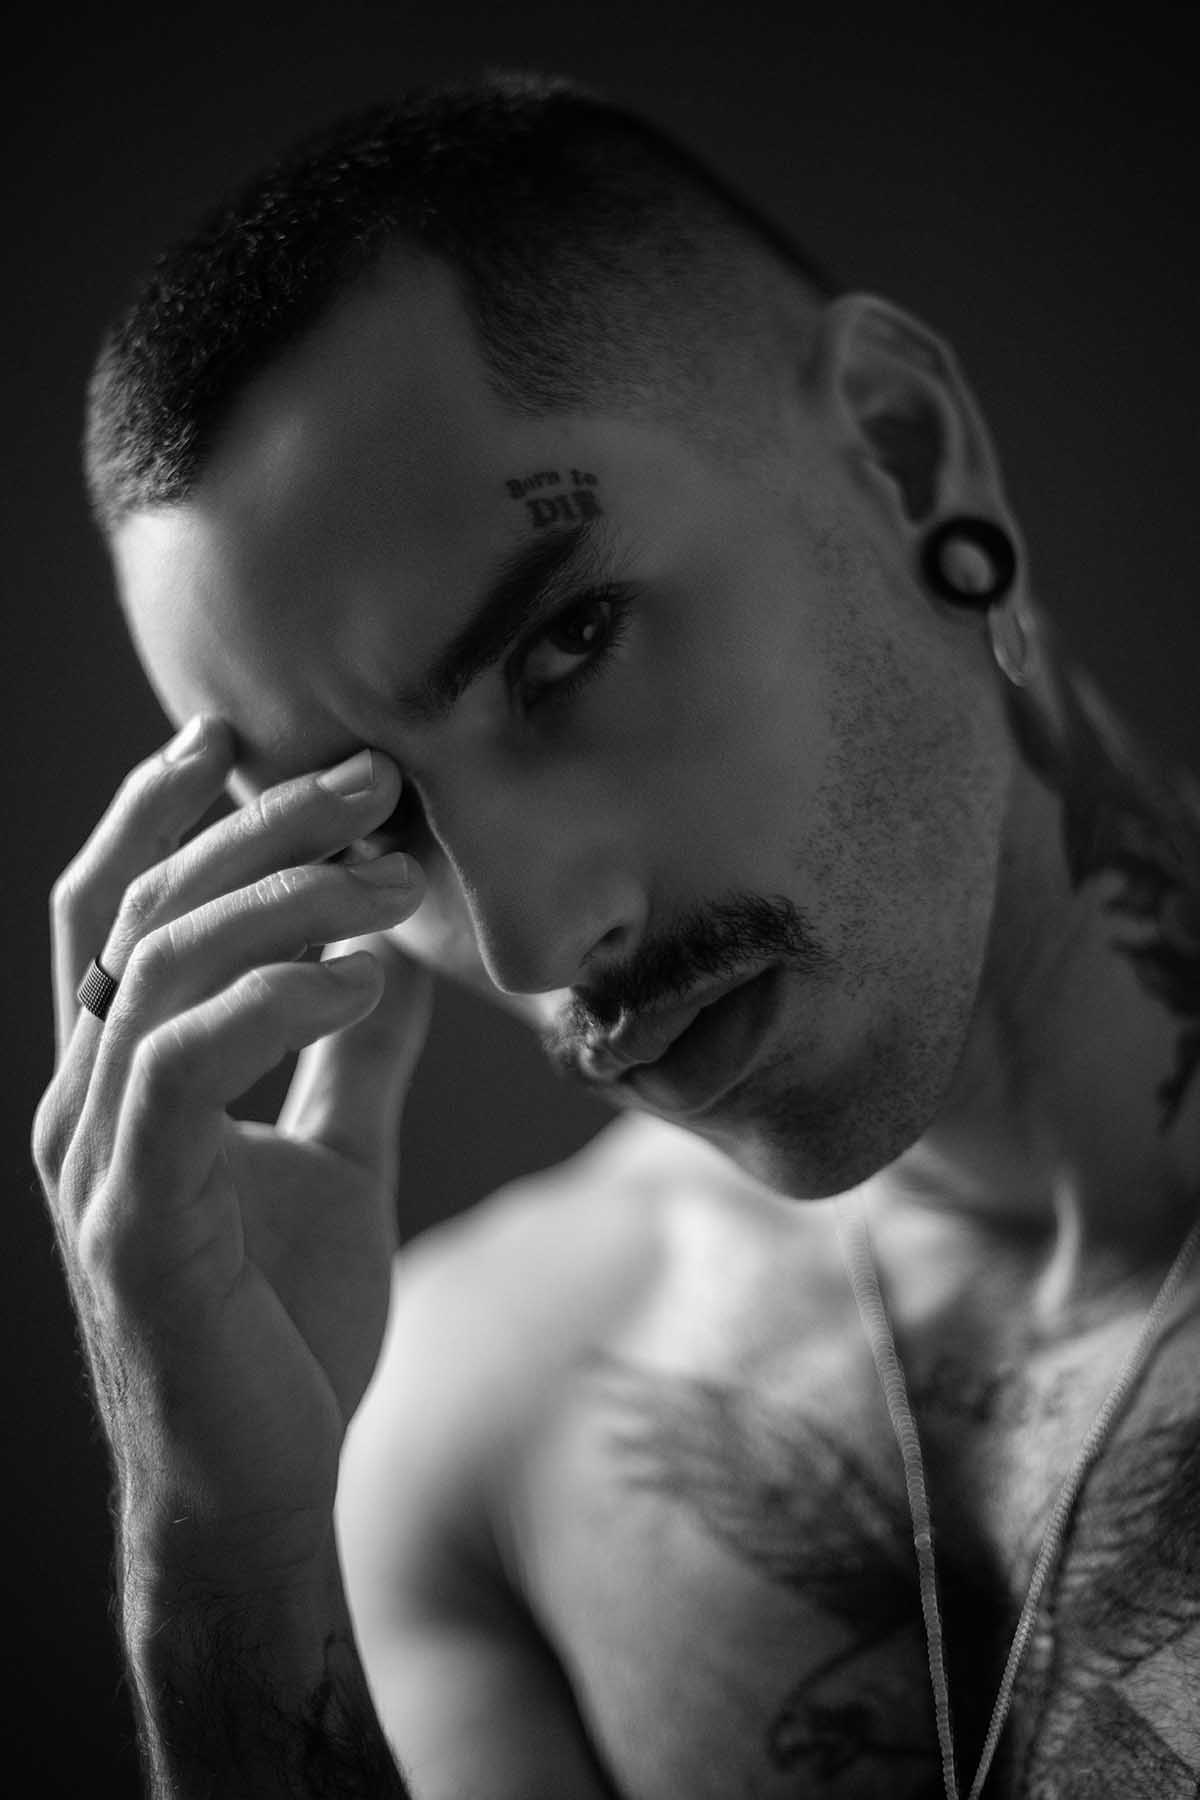 Carz Fill by Júlio Tavares for Brazilian Male Model